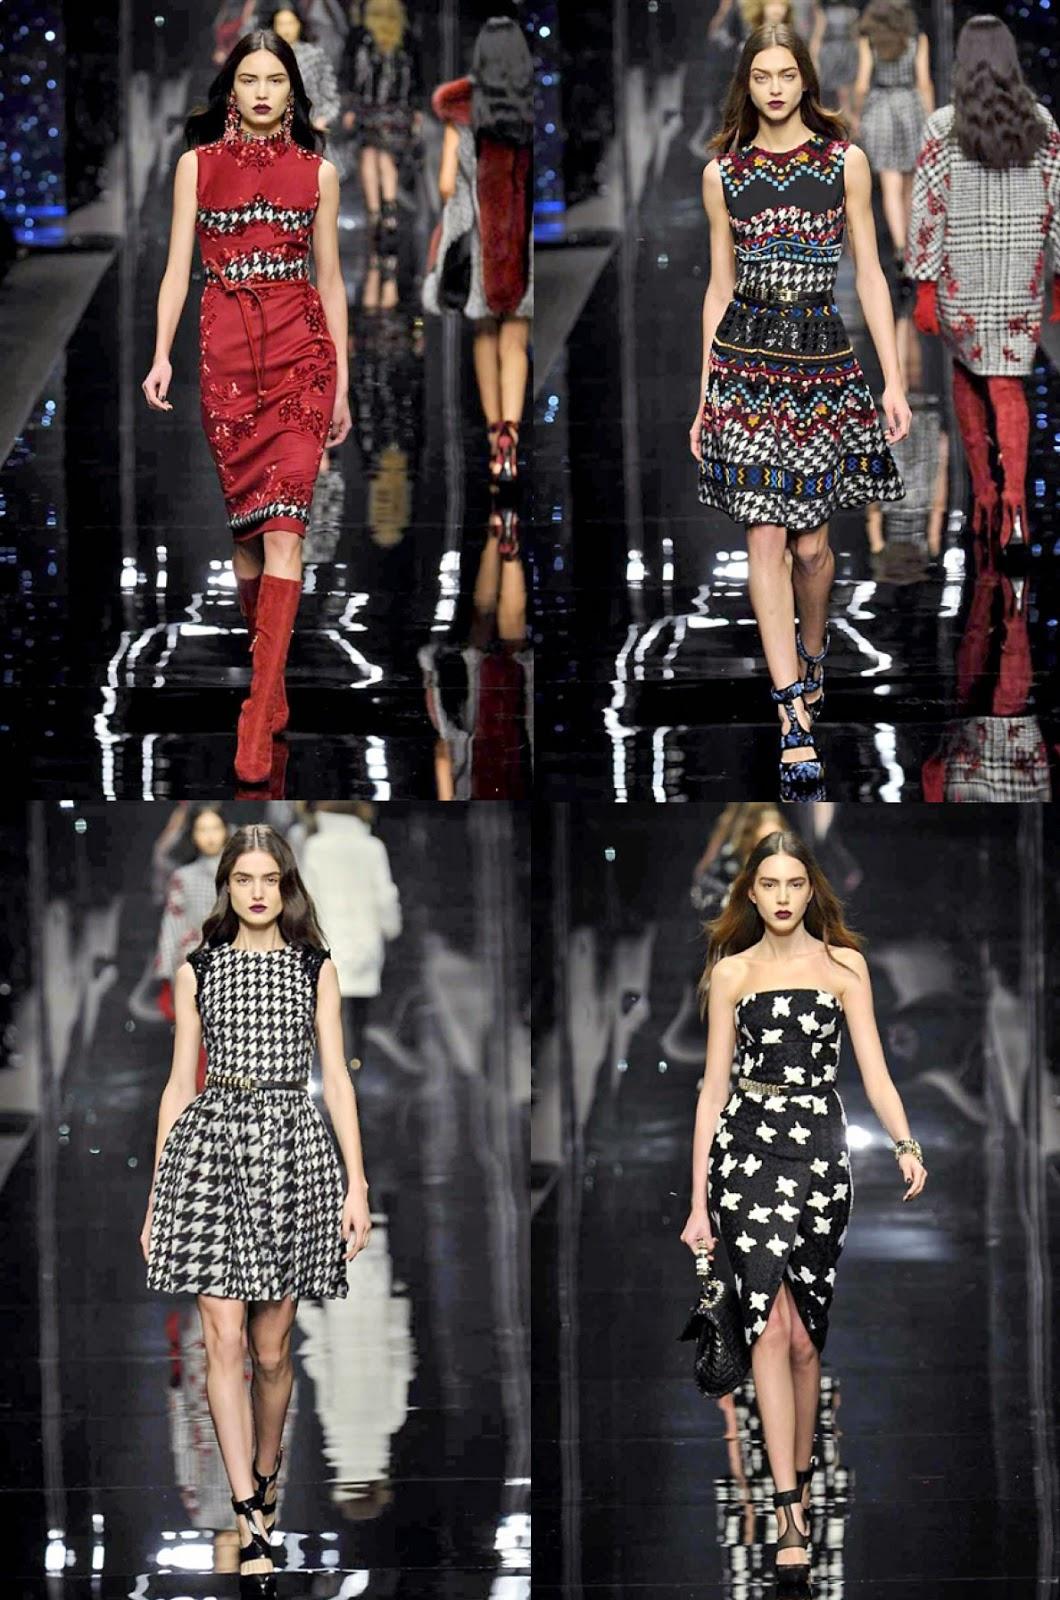 Eniwhere Fashion - Milano Fashion Week - Ermanno Scervino - Fall Winter 2015-2016